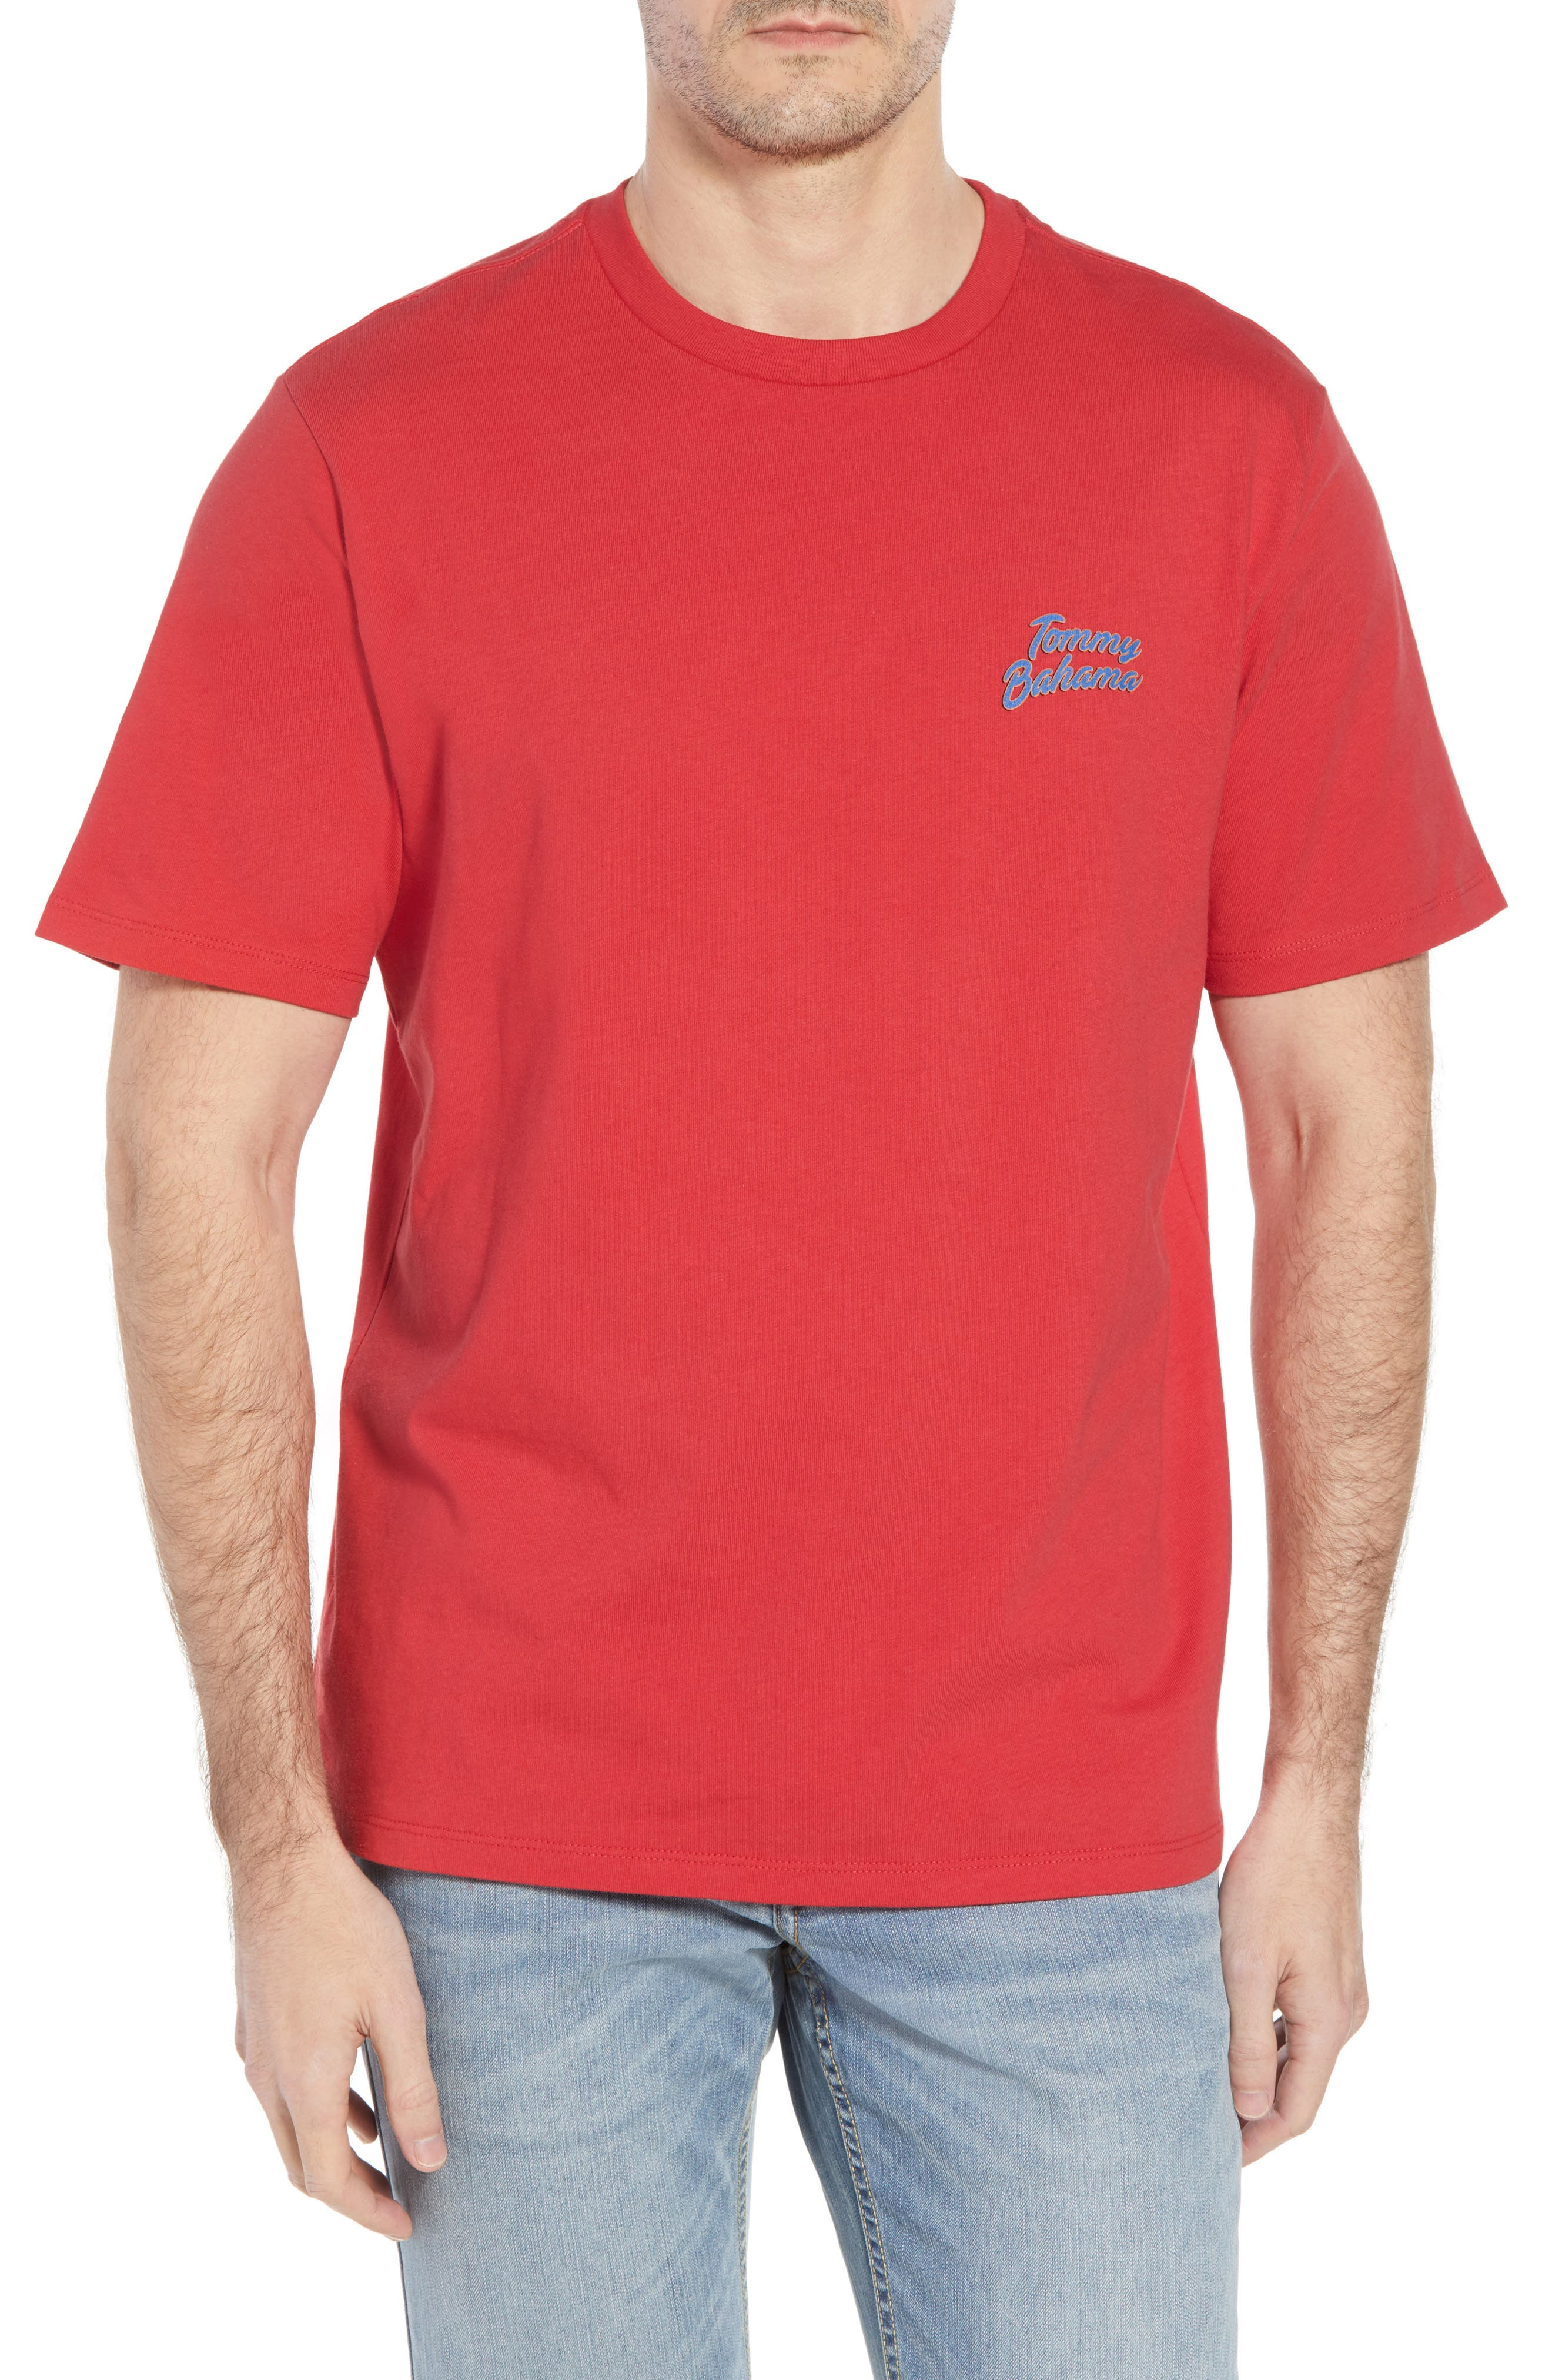 Thirst Base Graphic T-Shirt,                         Main,                         color, 600